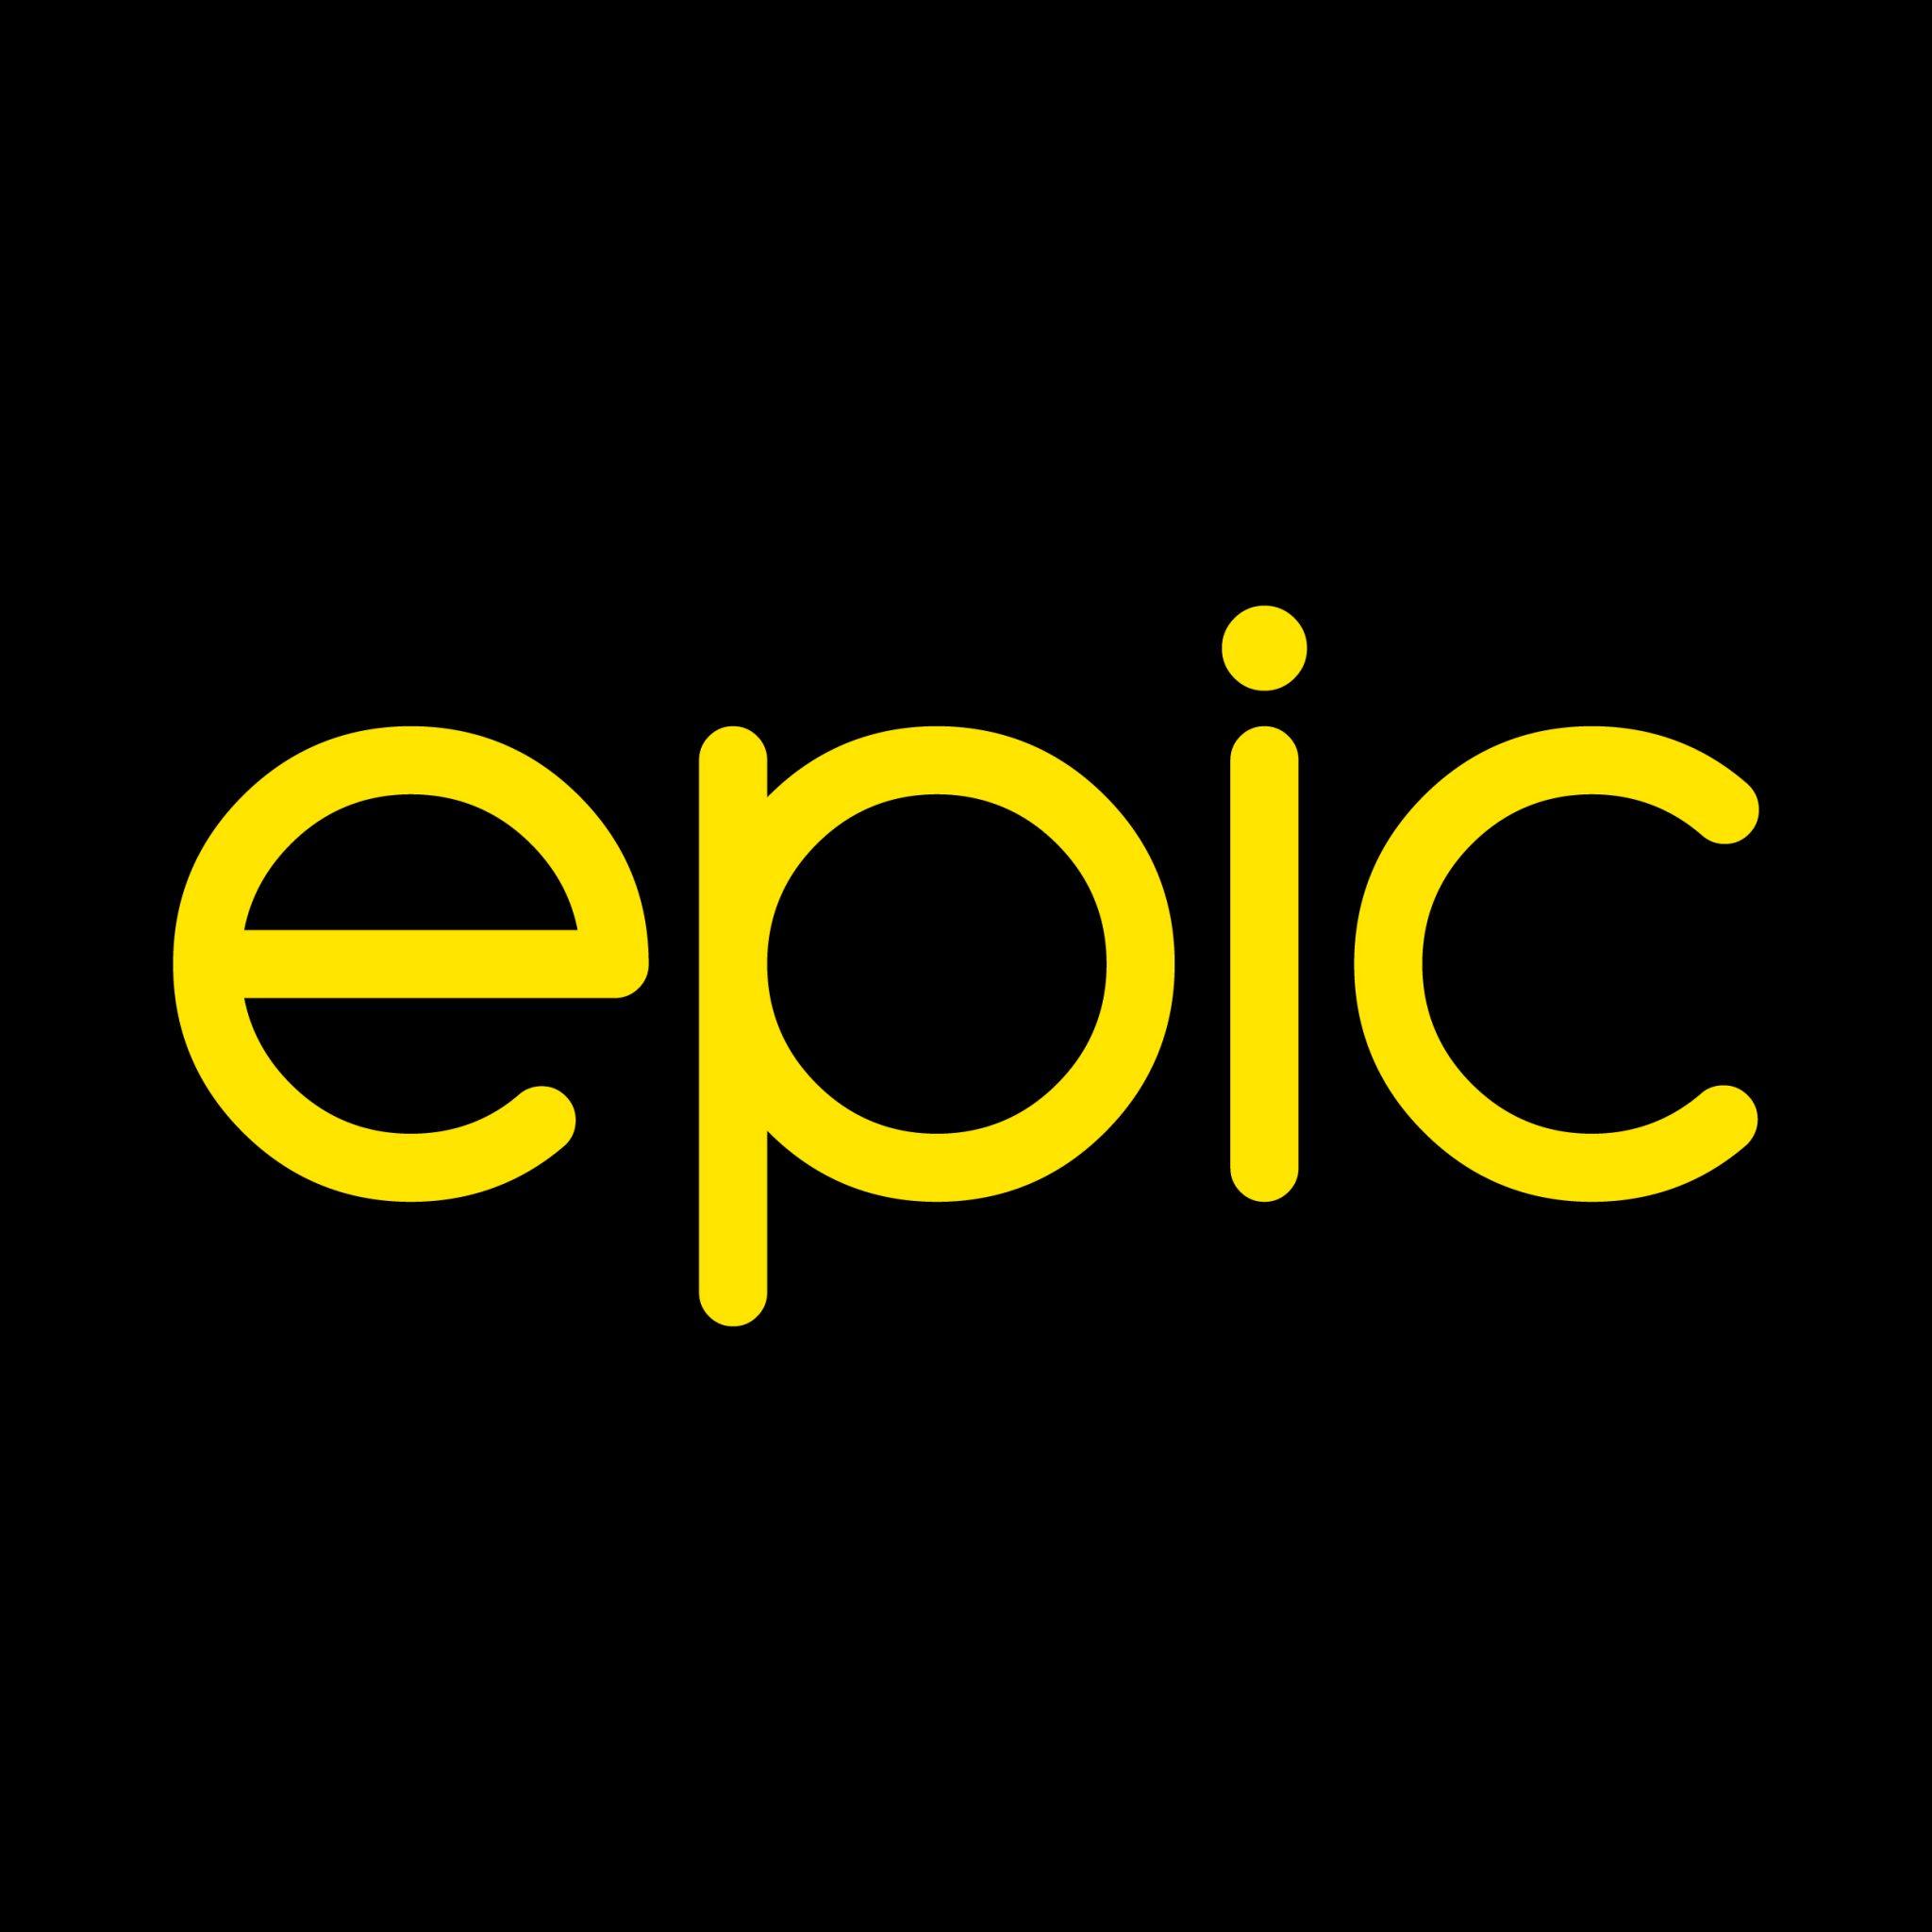 epic-logo